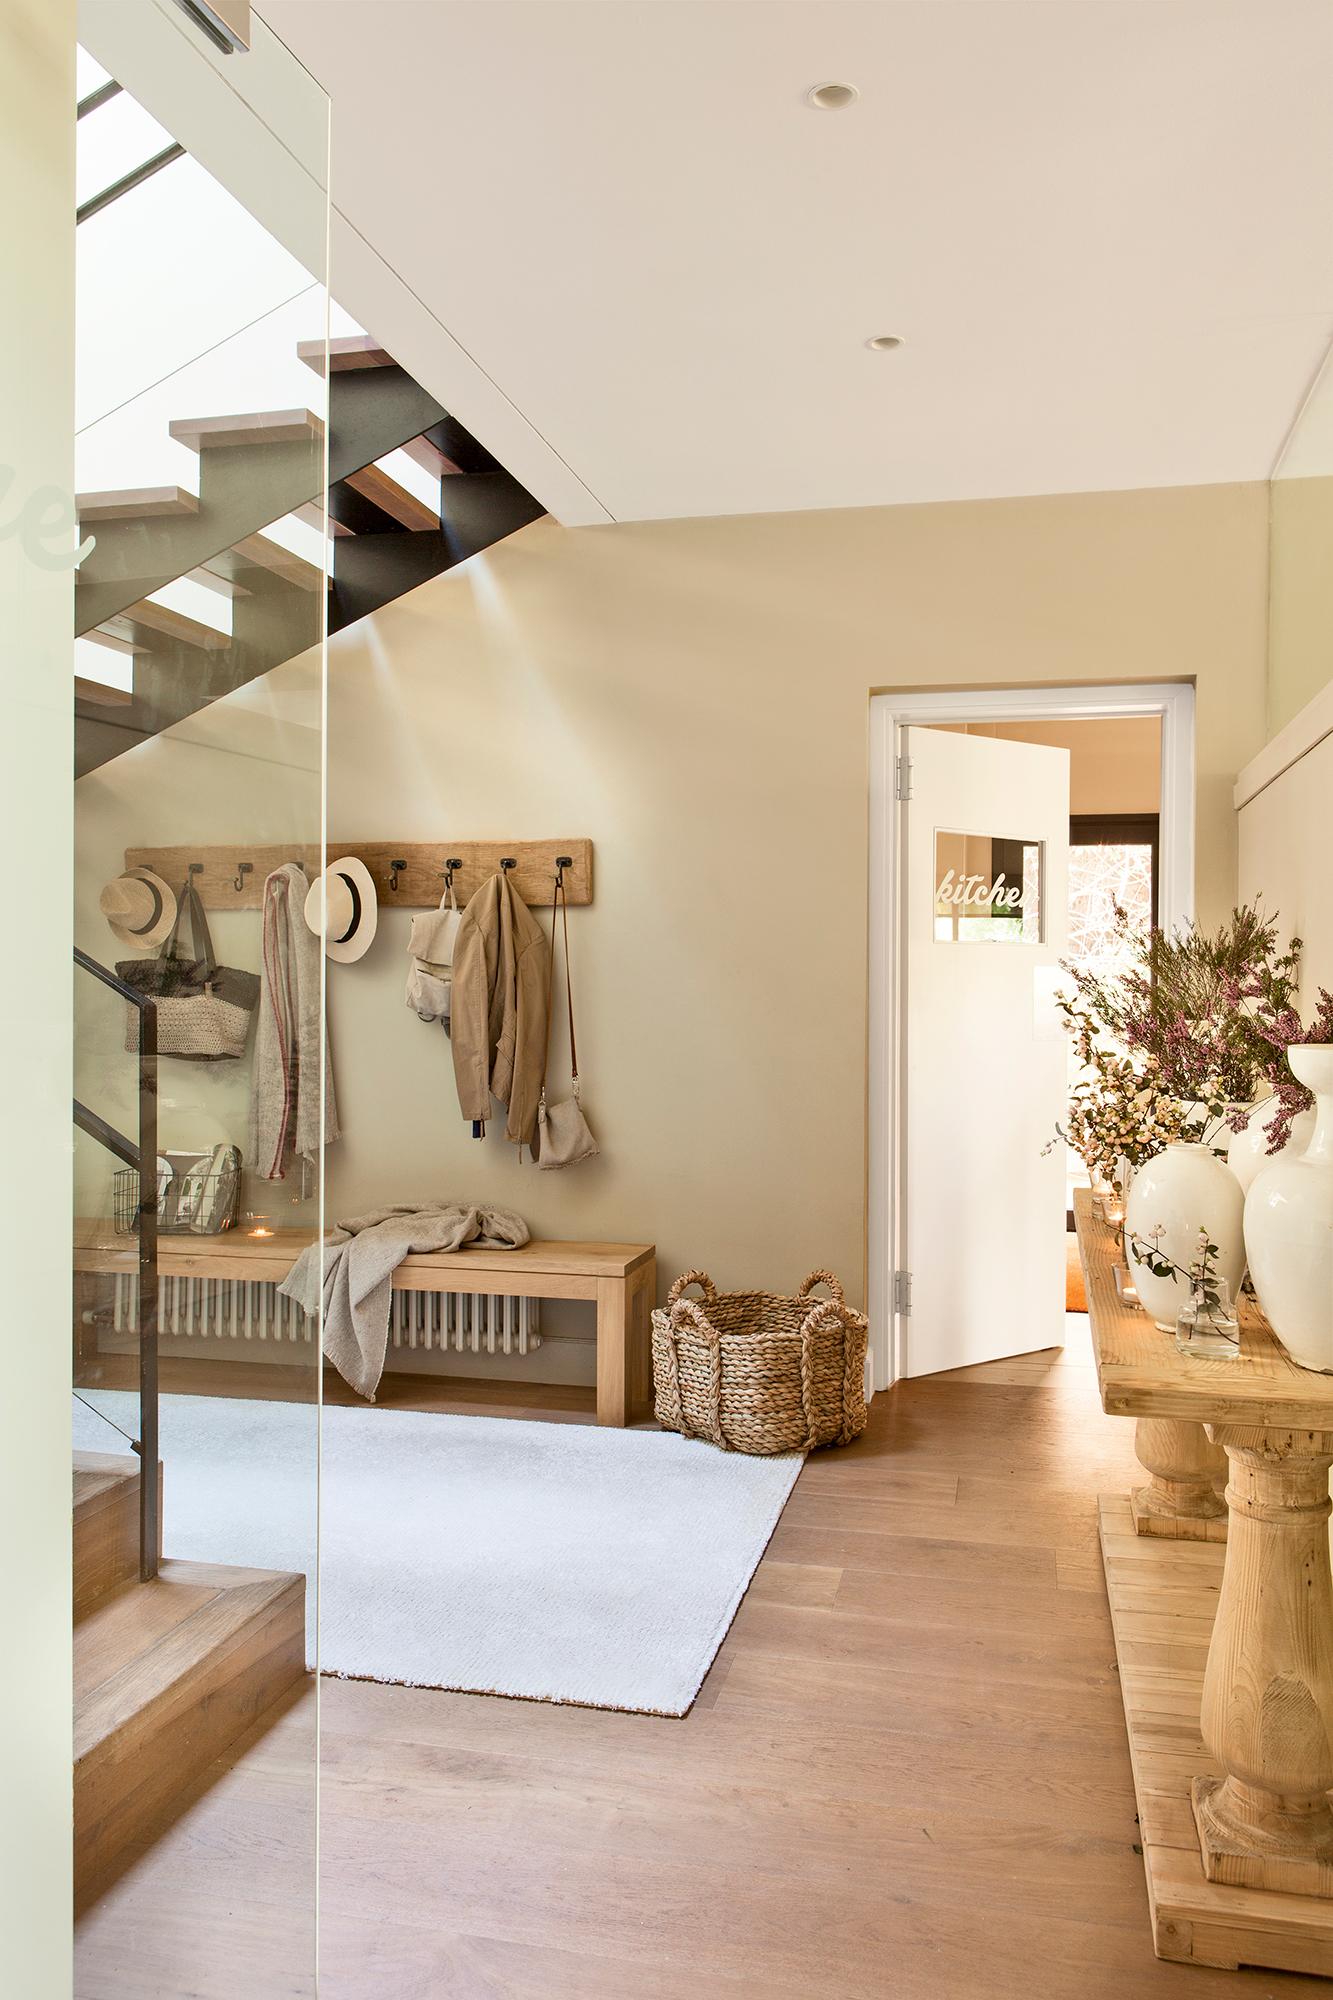 Escalera madera leroy merlin fabulous decoracin - Escalera decoracion ikea ...